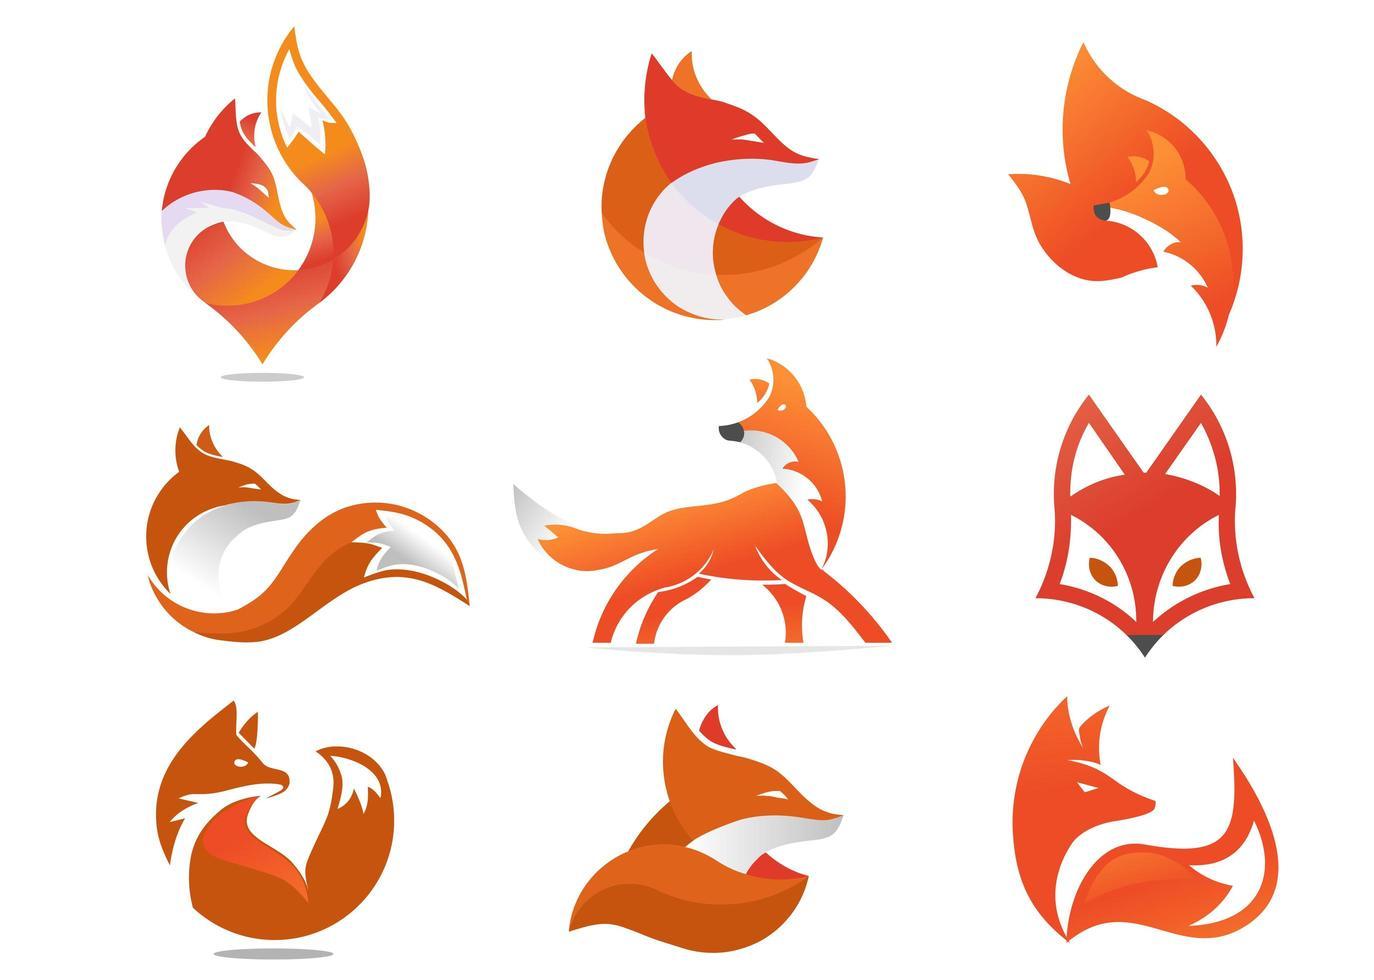 jeu d'icônes ou de logo de renard créatif vecteur